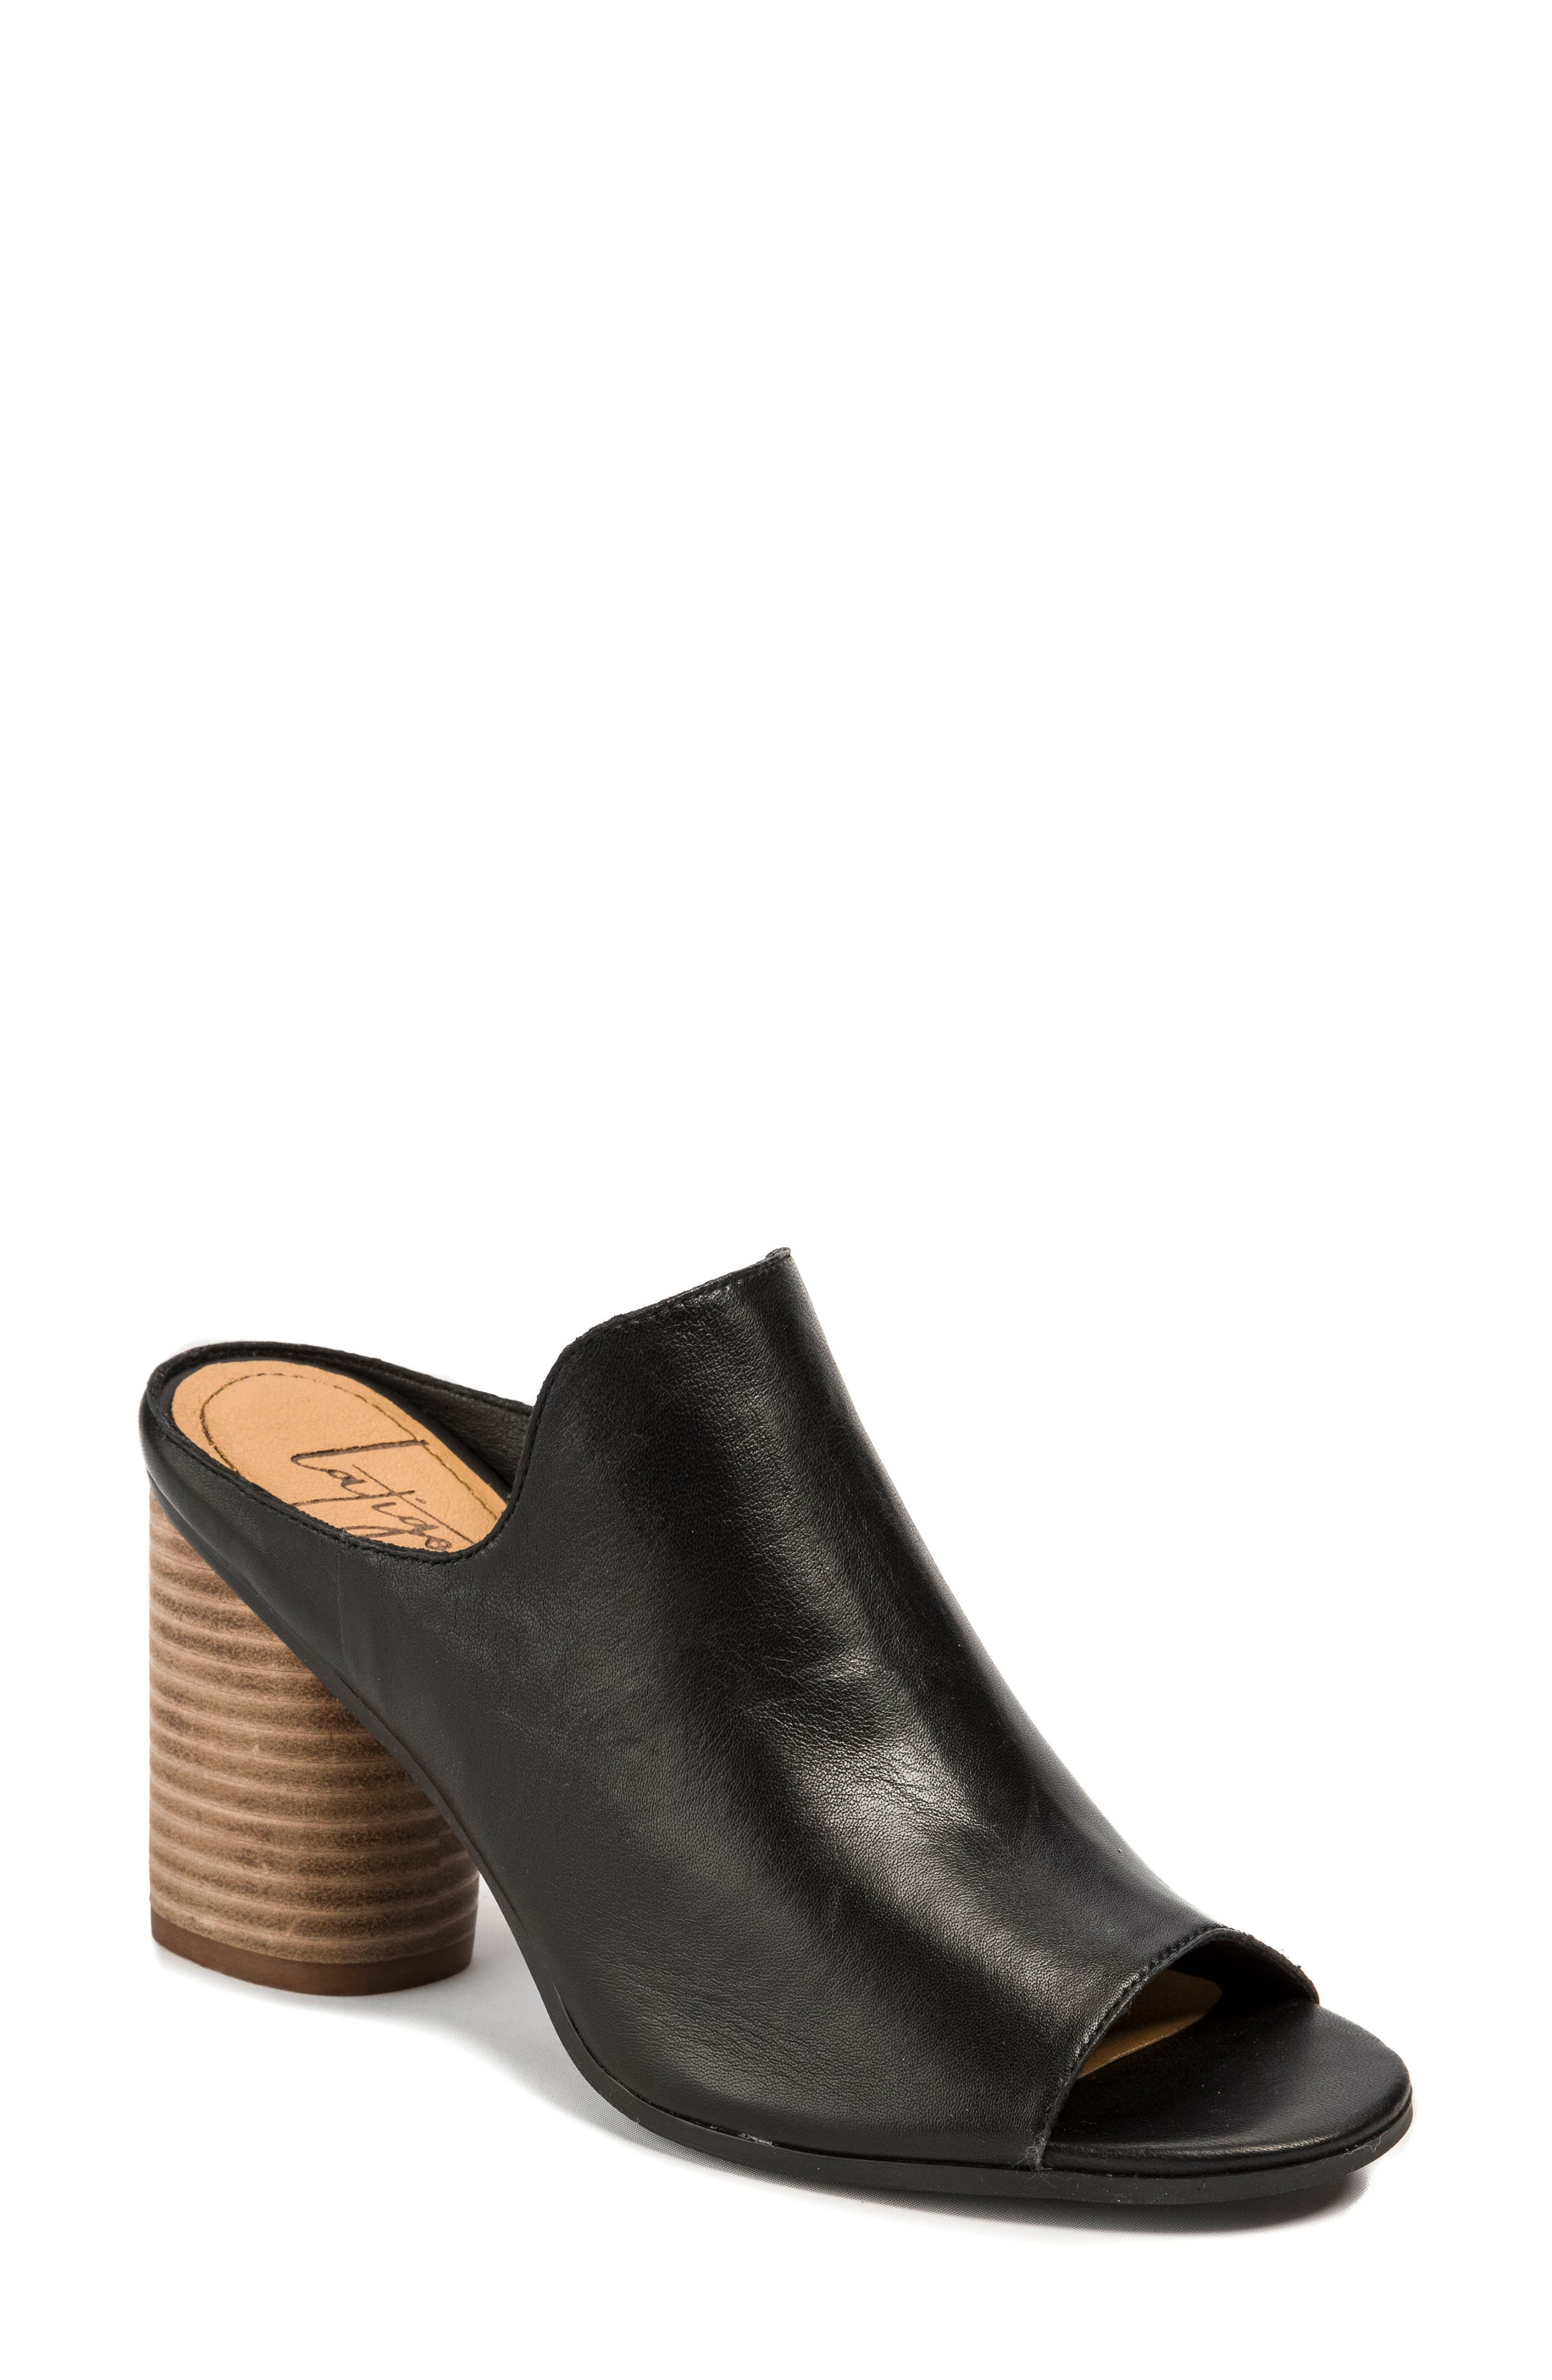 Hallie Loafer Sandal,                             Main thumbnail 1, color,                             001